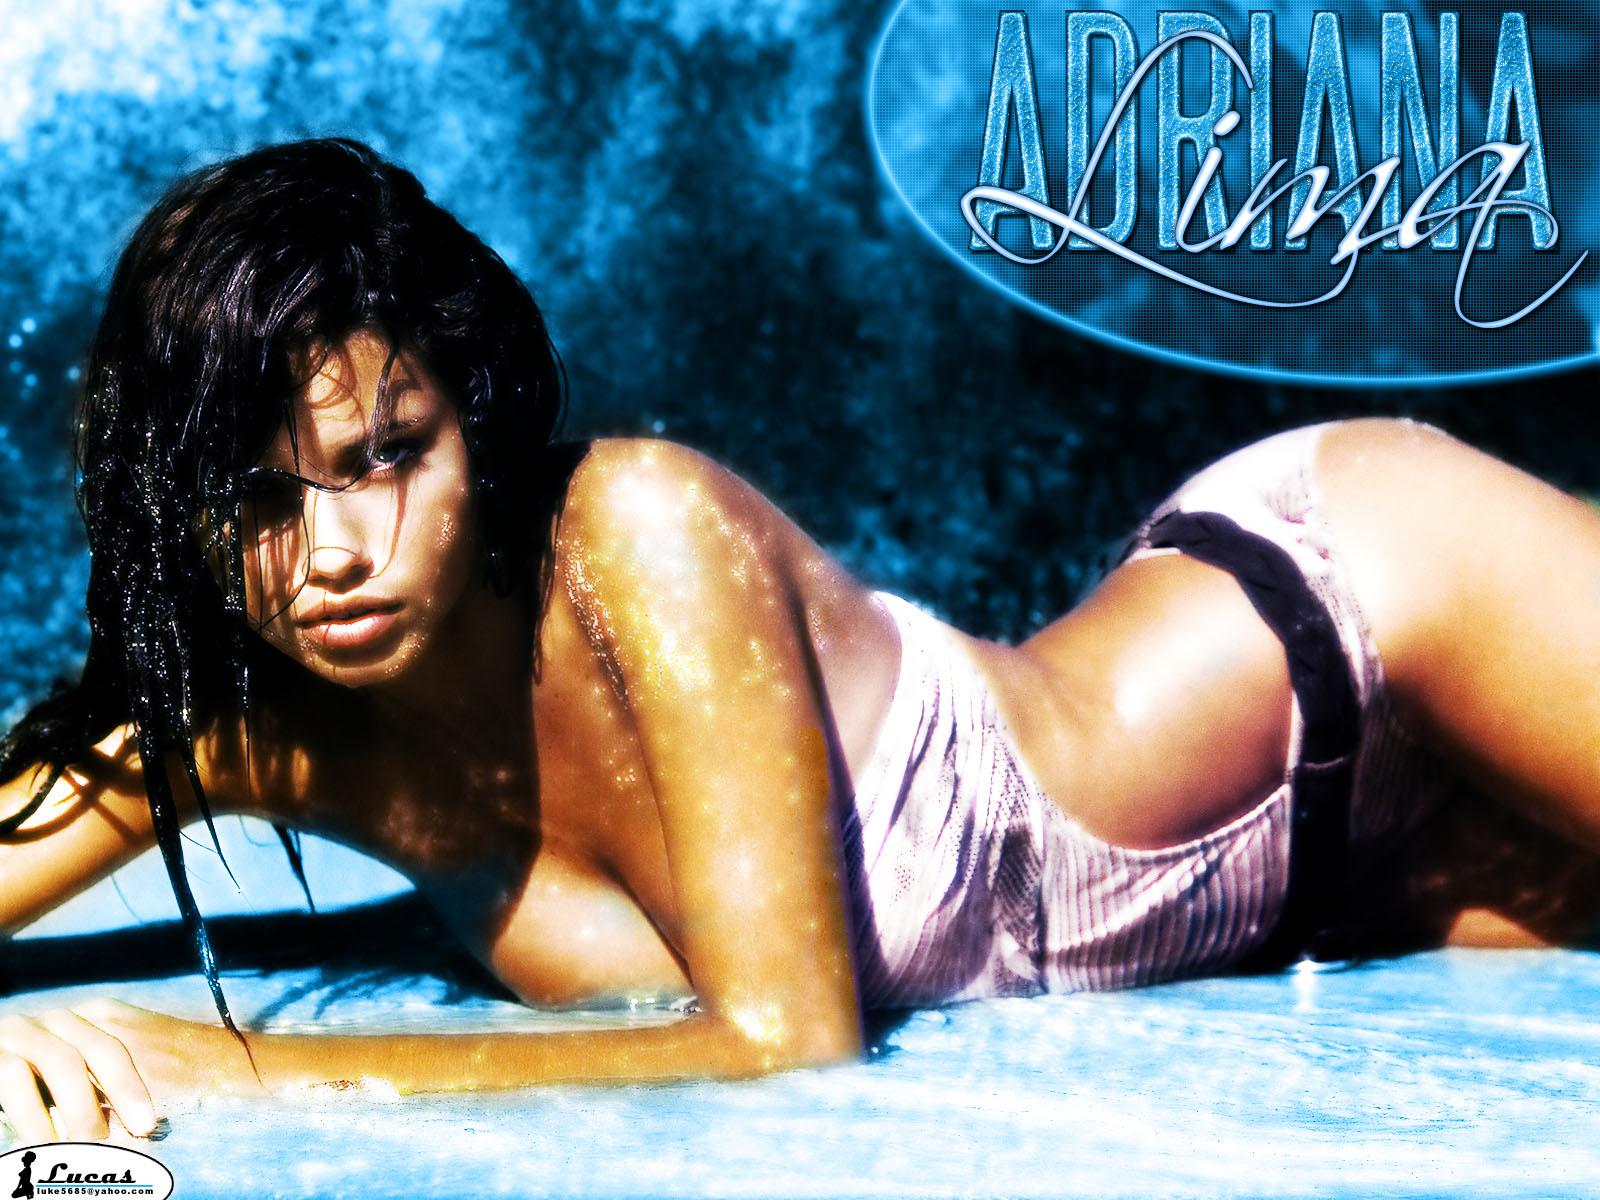 http://1.bp.blogspot.com/-d83WVTHdriI/T39aYTc56_I/AAAAAAAADjk/yfrVGJpX6go/s1600/Adriana+Lima+Sexy.jpg